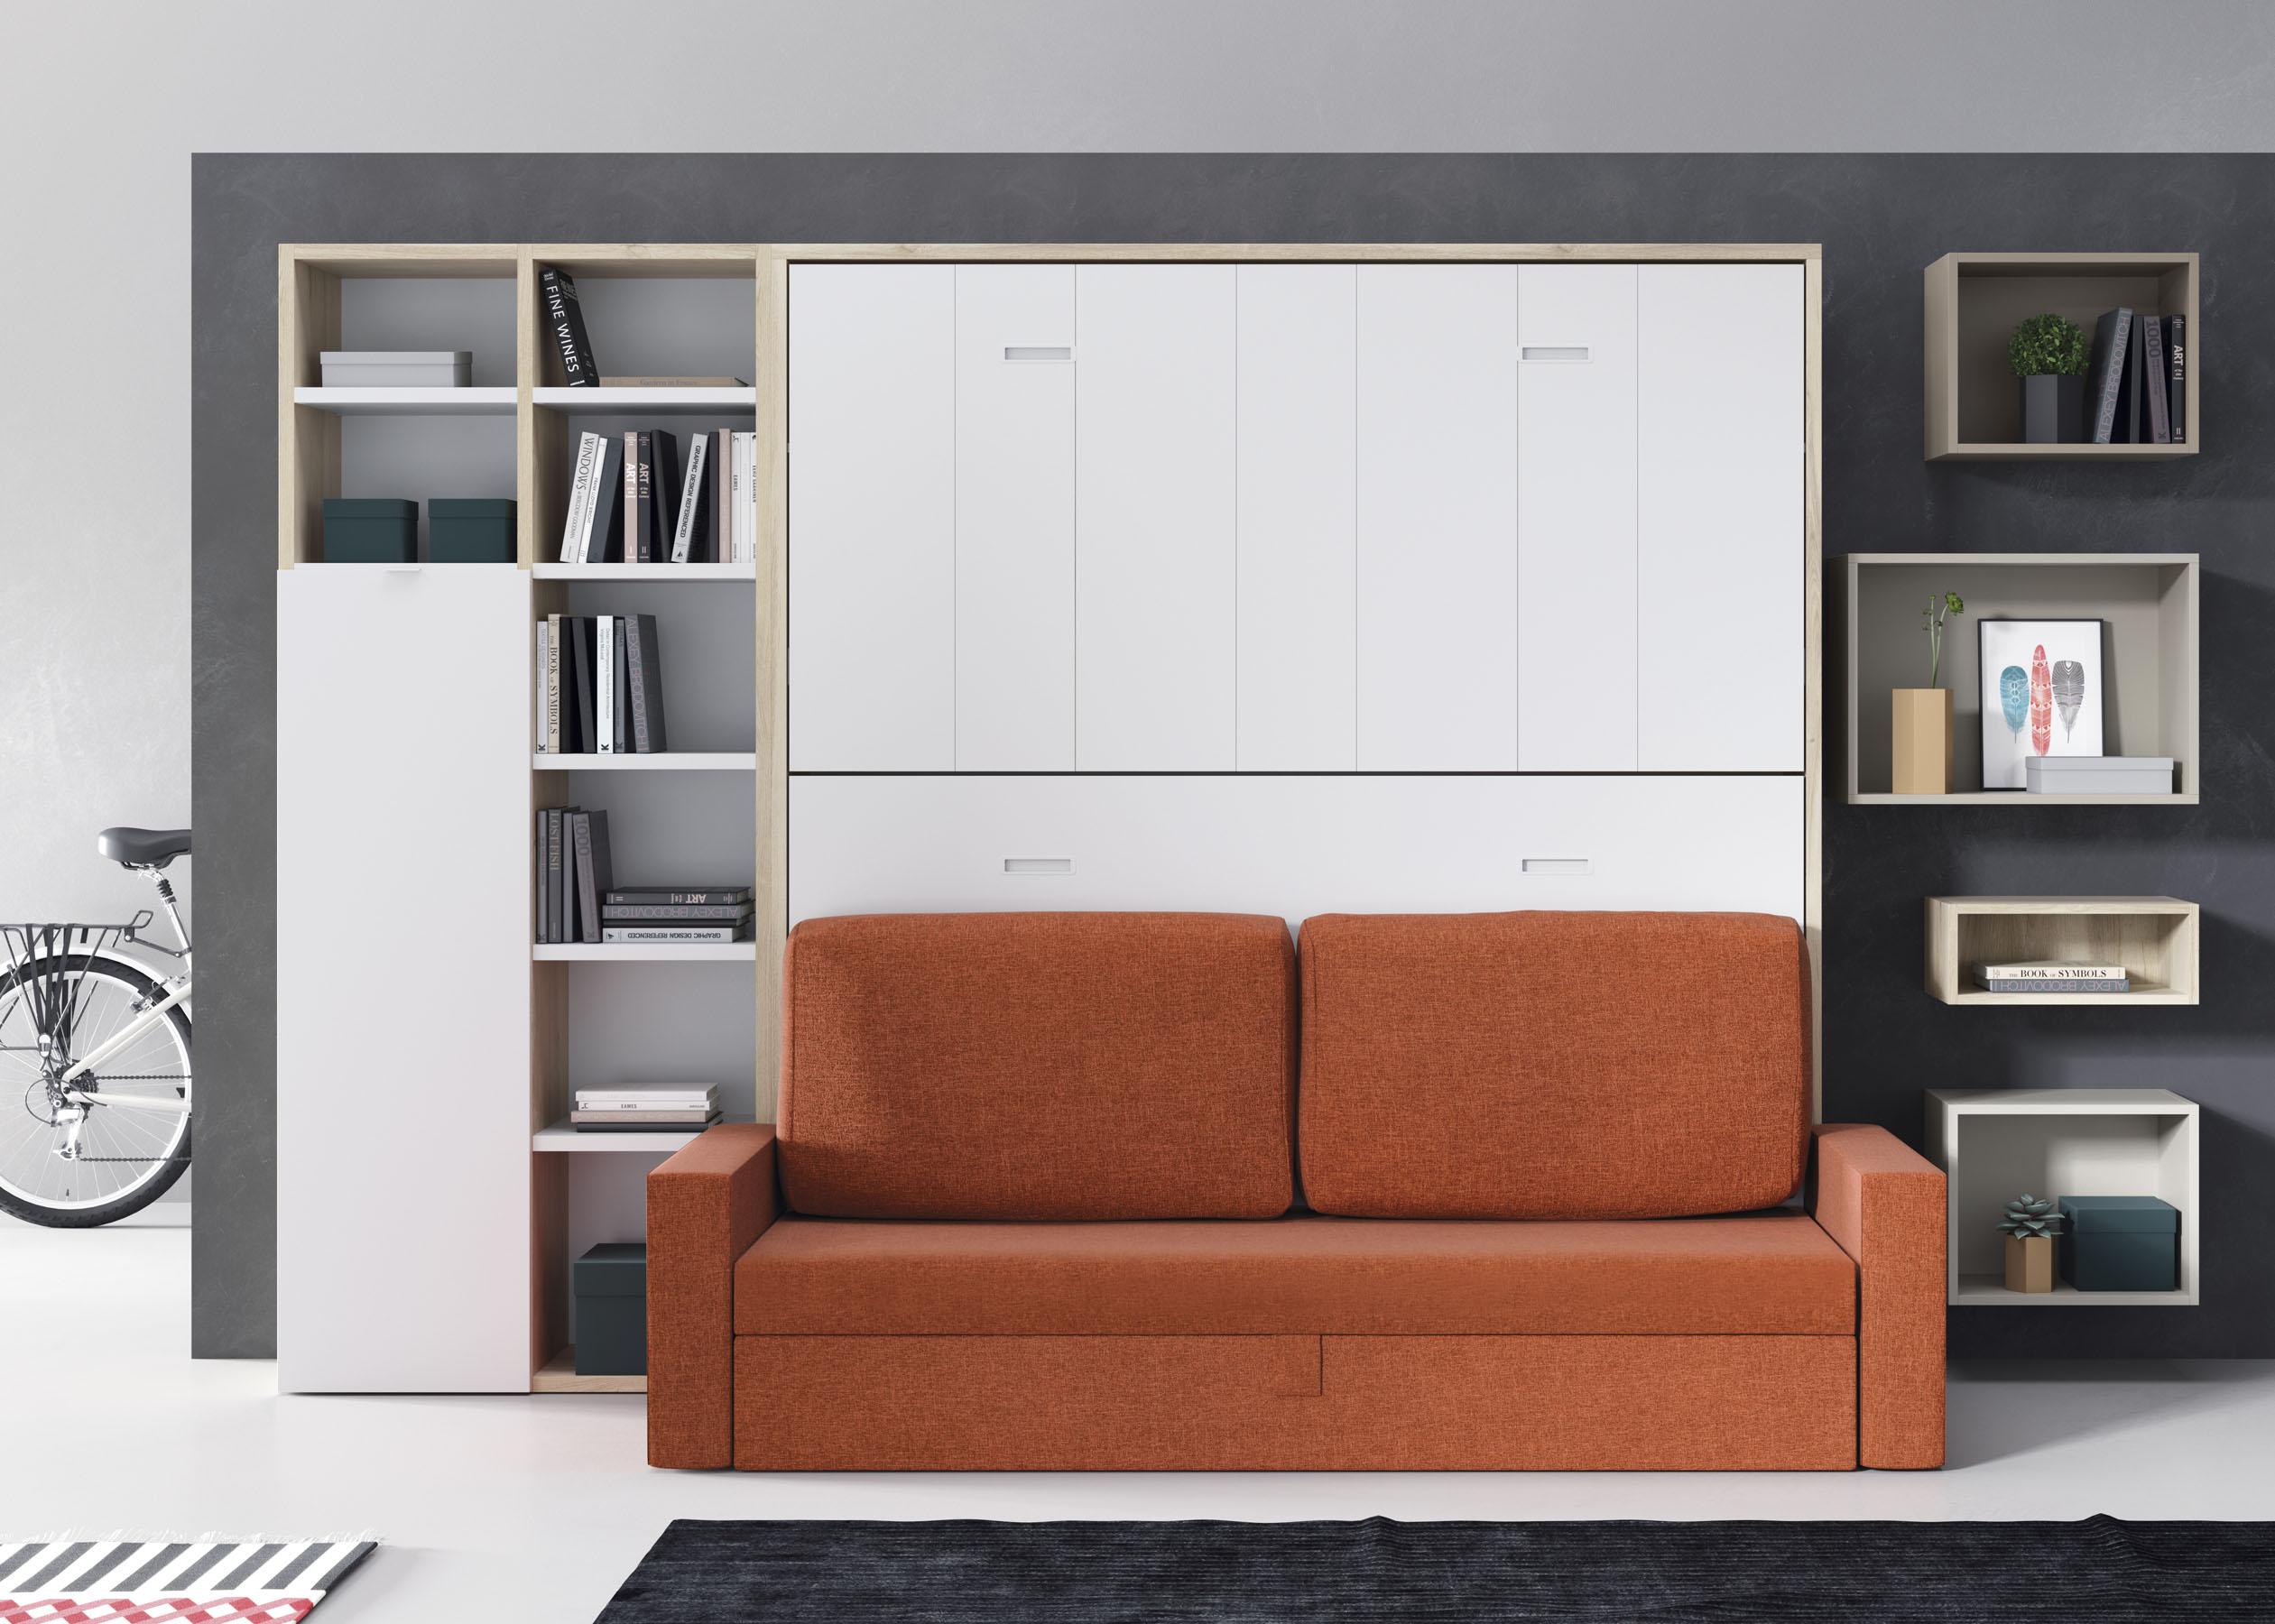 Camas abatibles horizontales con sofa camas abatibles for Decoracion de sofas